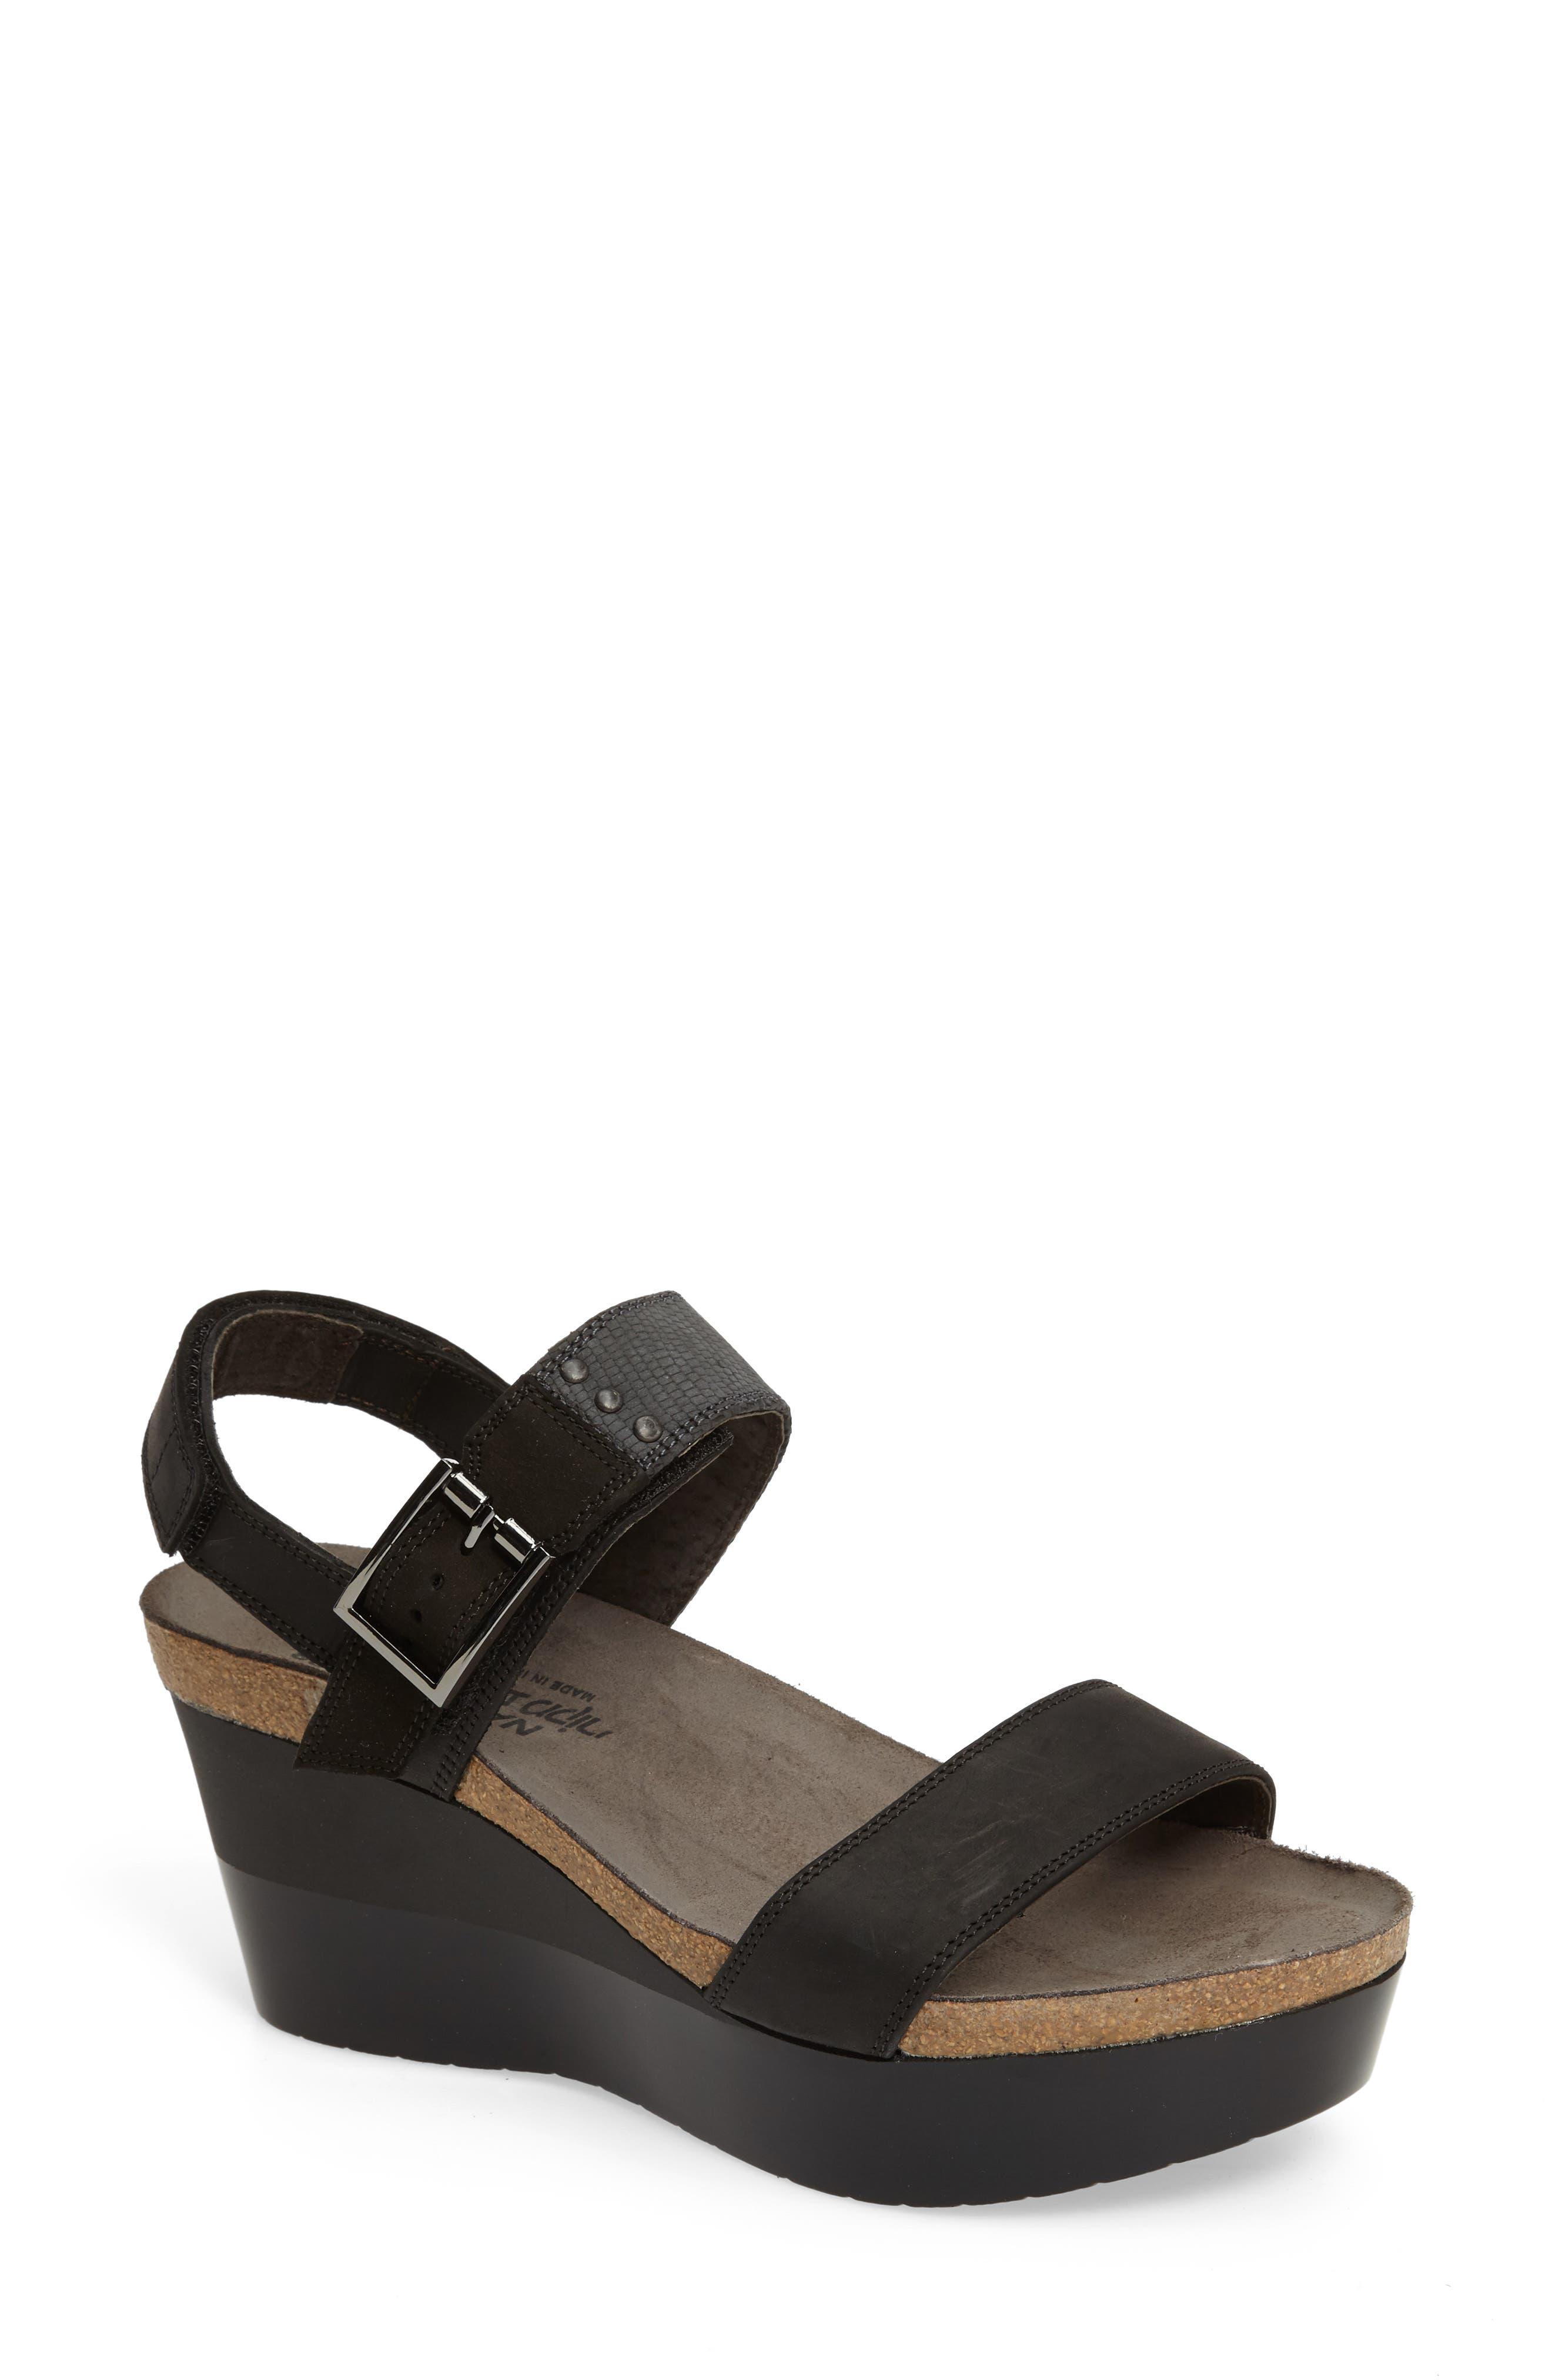 Alpha Platform Wedge Sandal Sandal,                             Main thumbnail 1, color,                             020